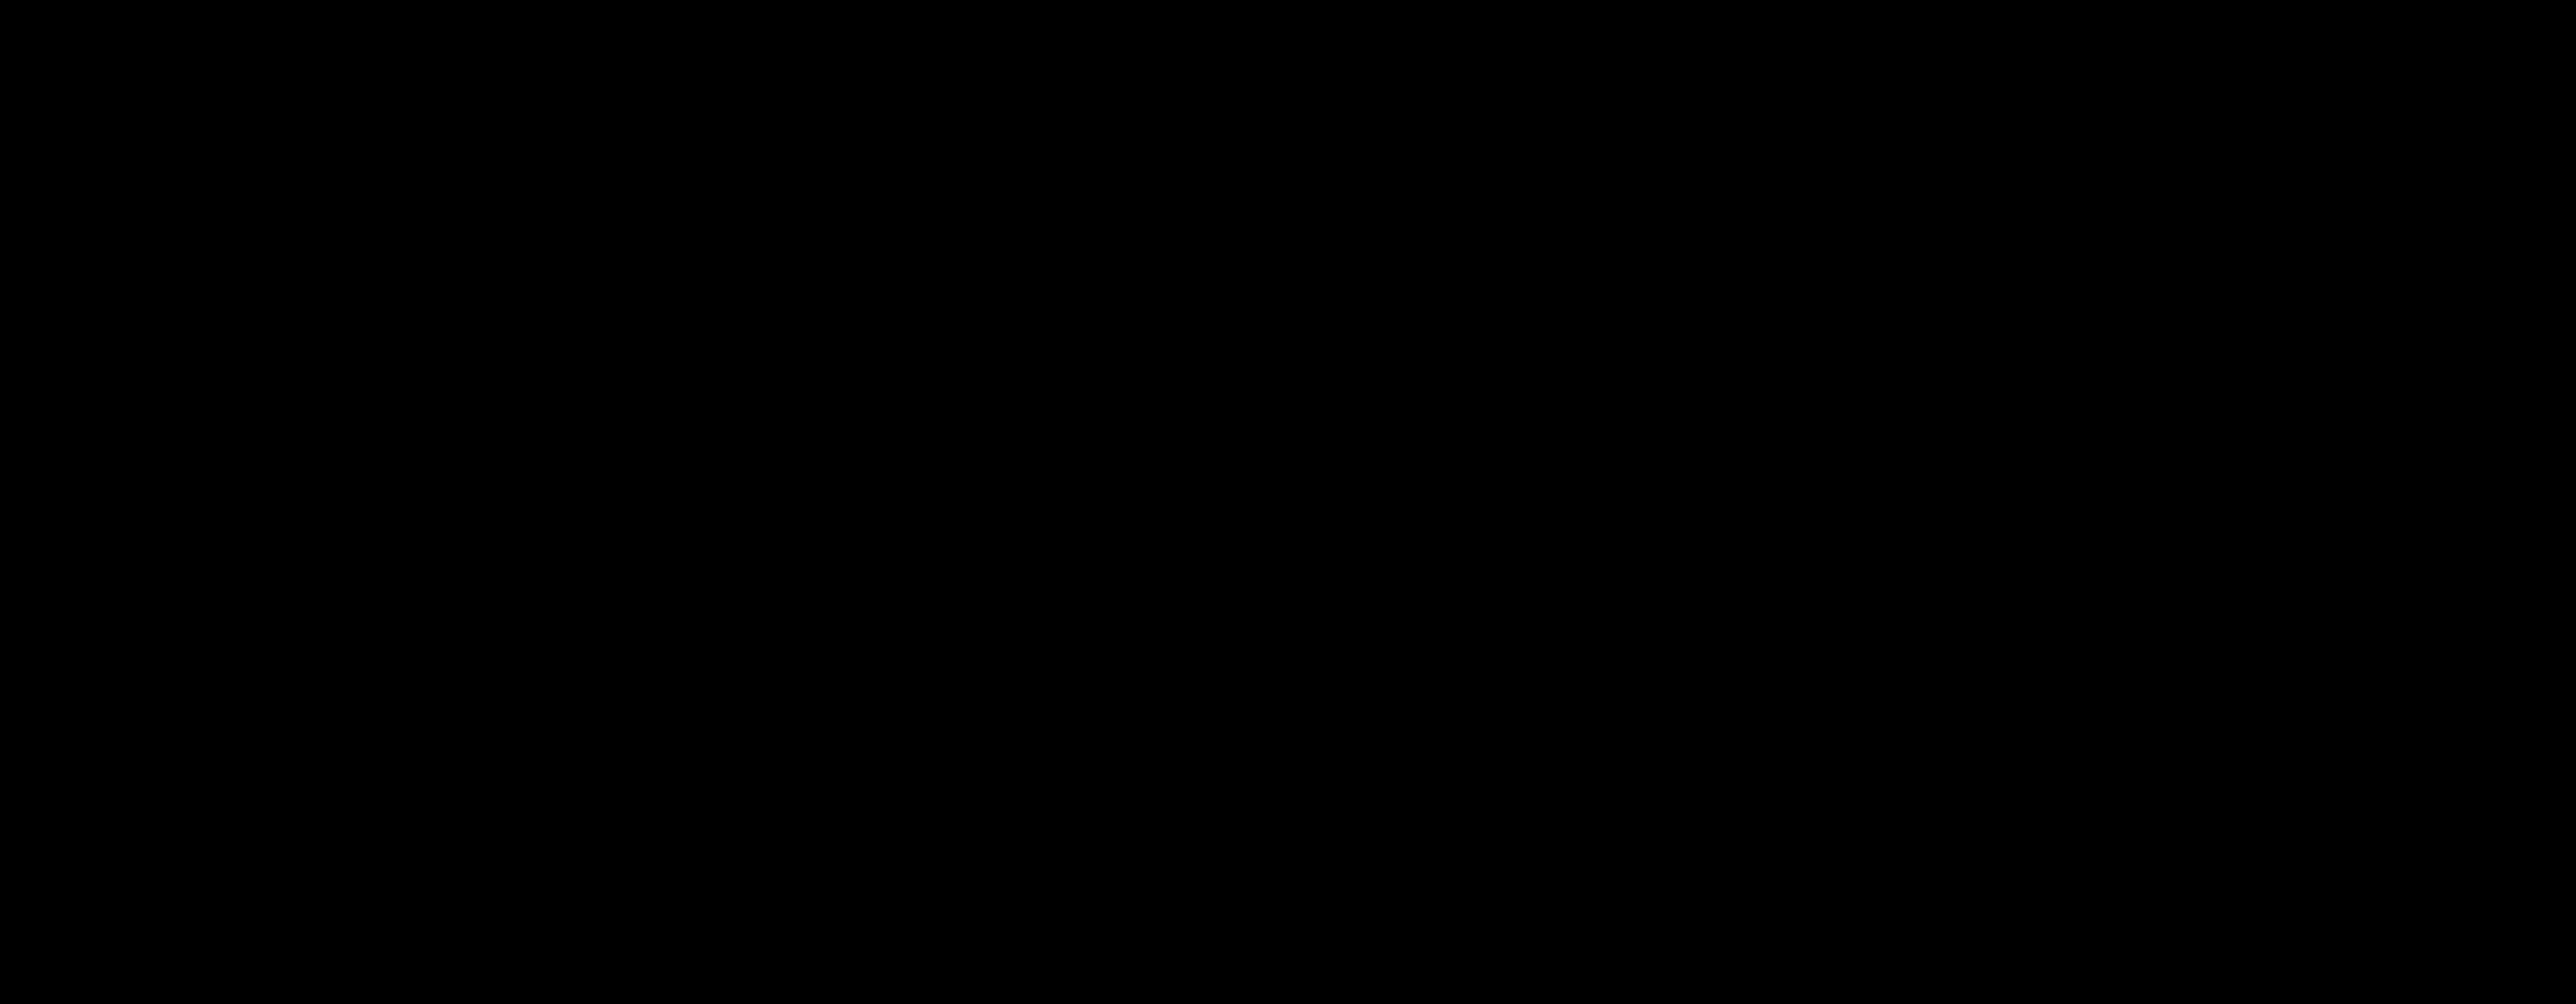 KluswoningSpot